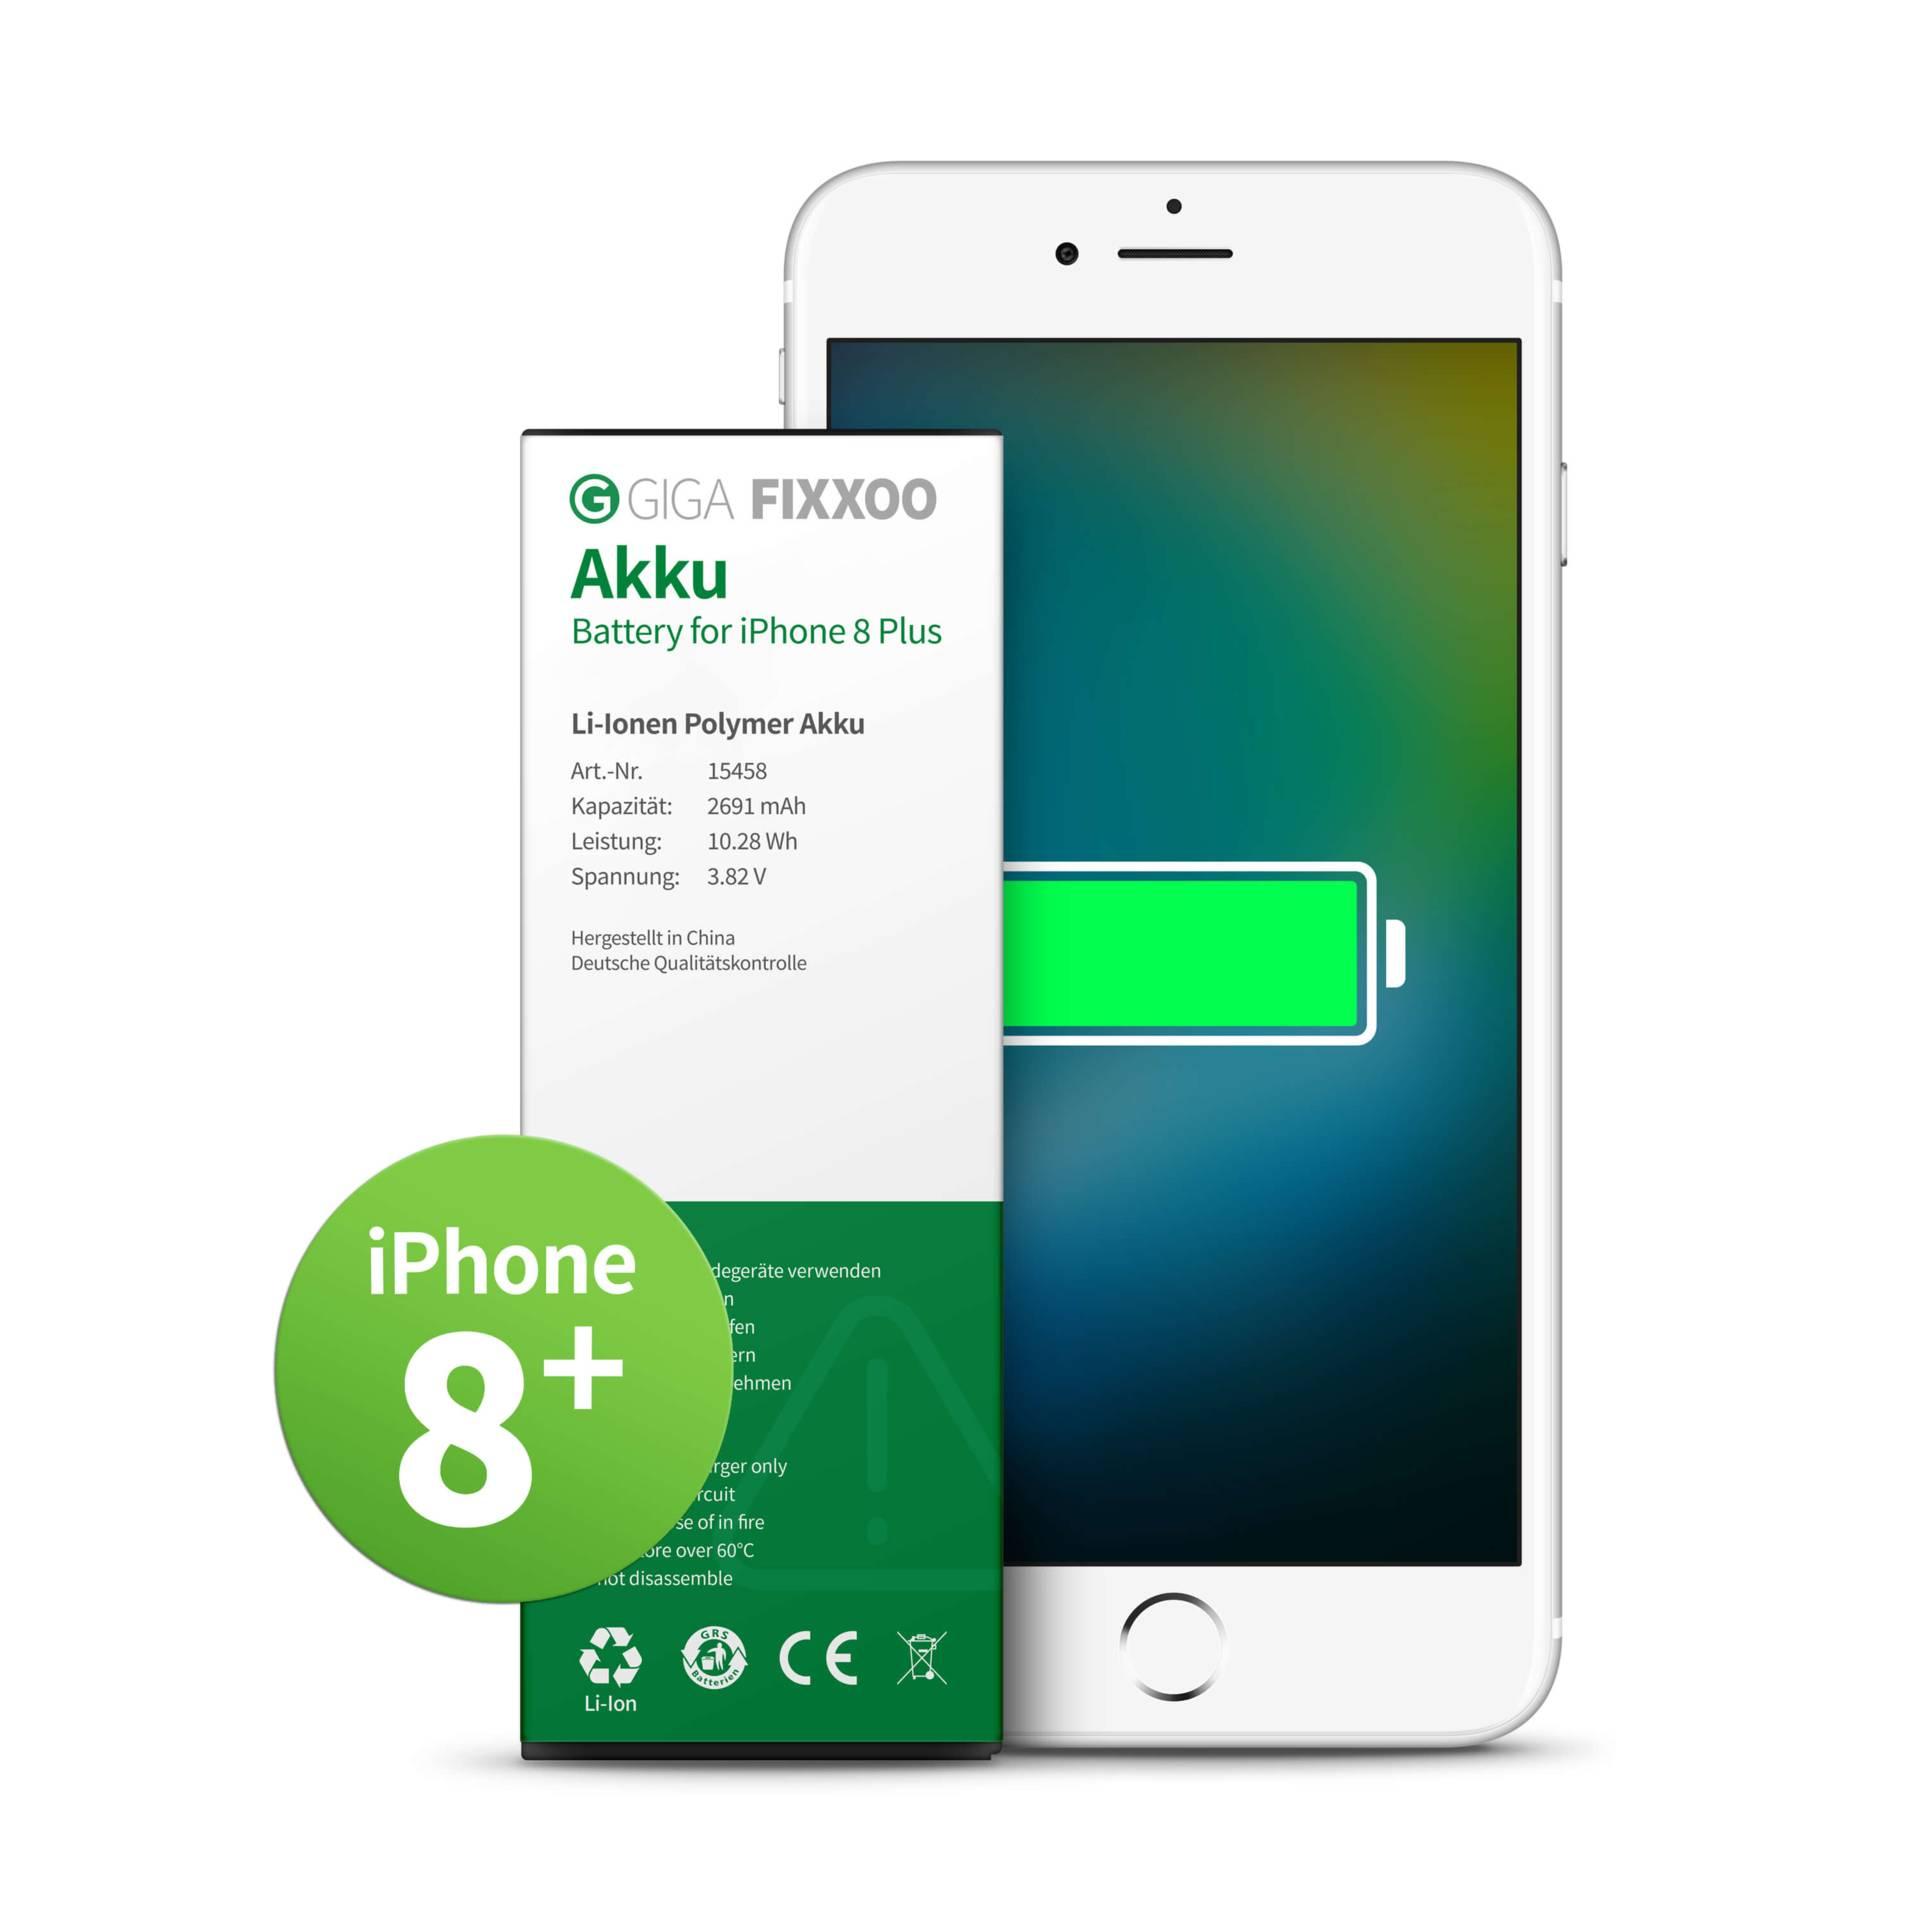 GIGA Fixxoo iPhone 8 Plus Akku